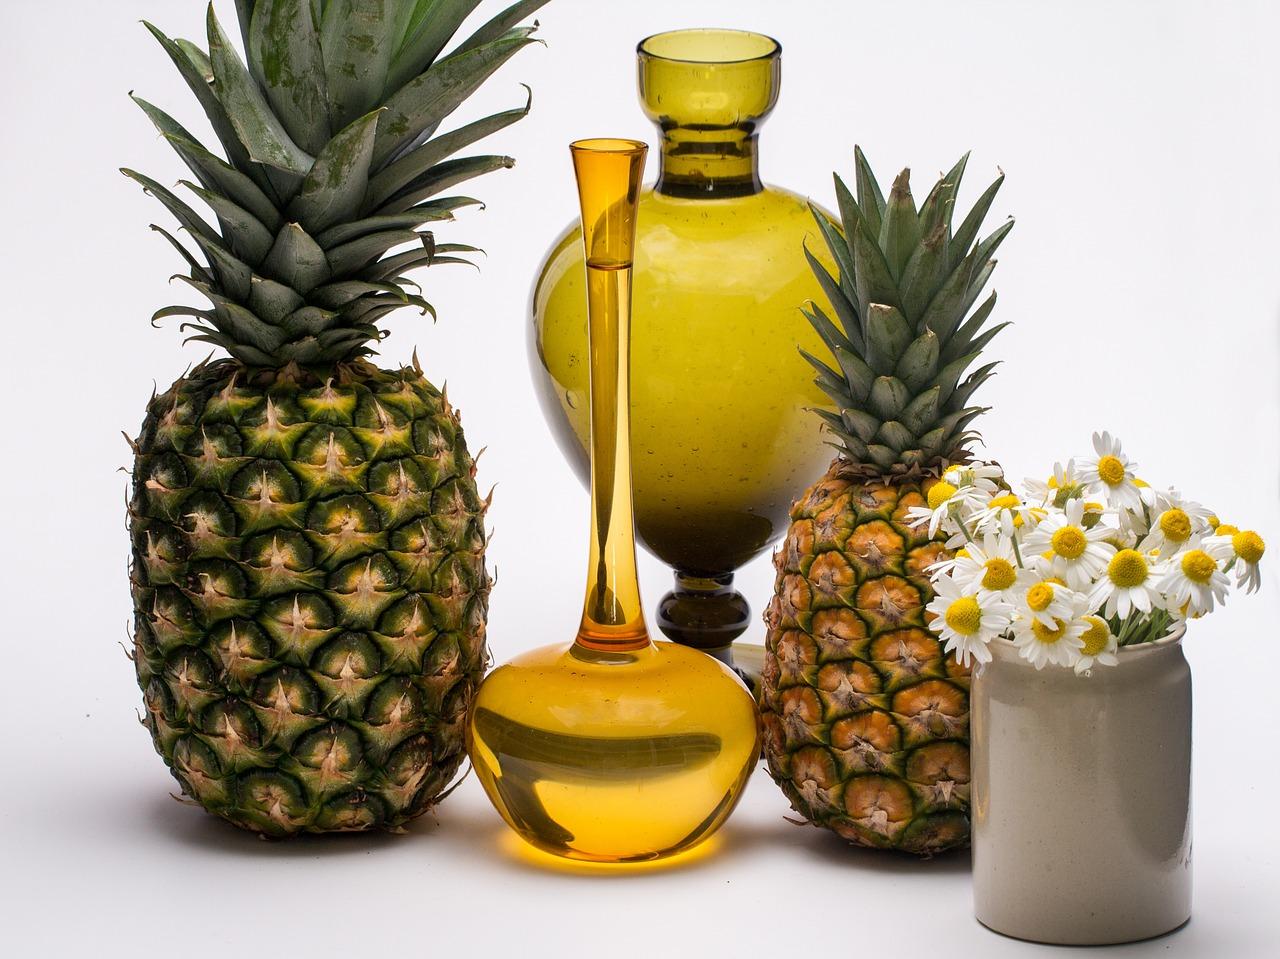 e131b10f29f01c3e81584d04ee44408be273ead51fb7114493f1_1280_Pineapples